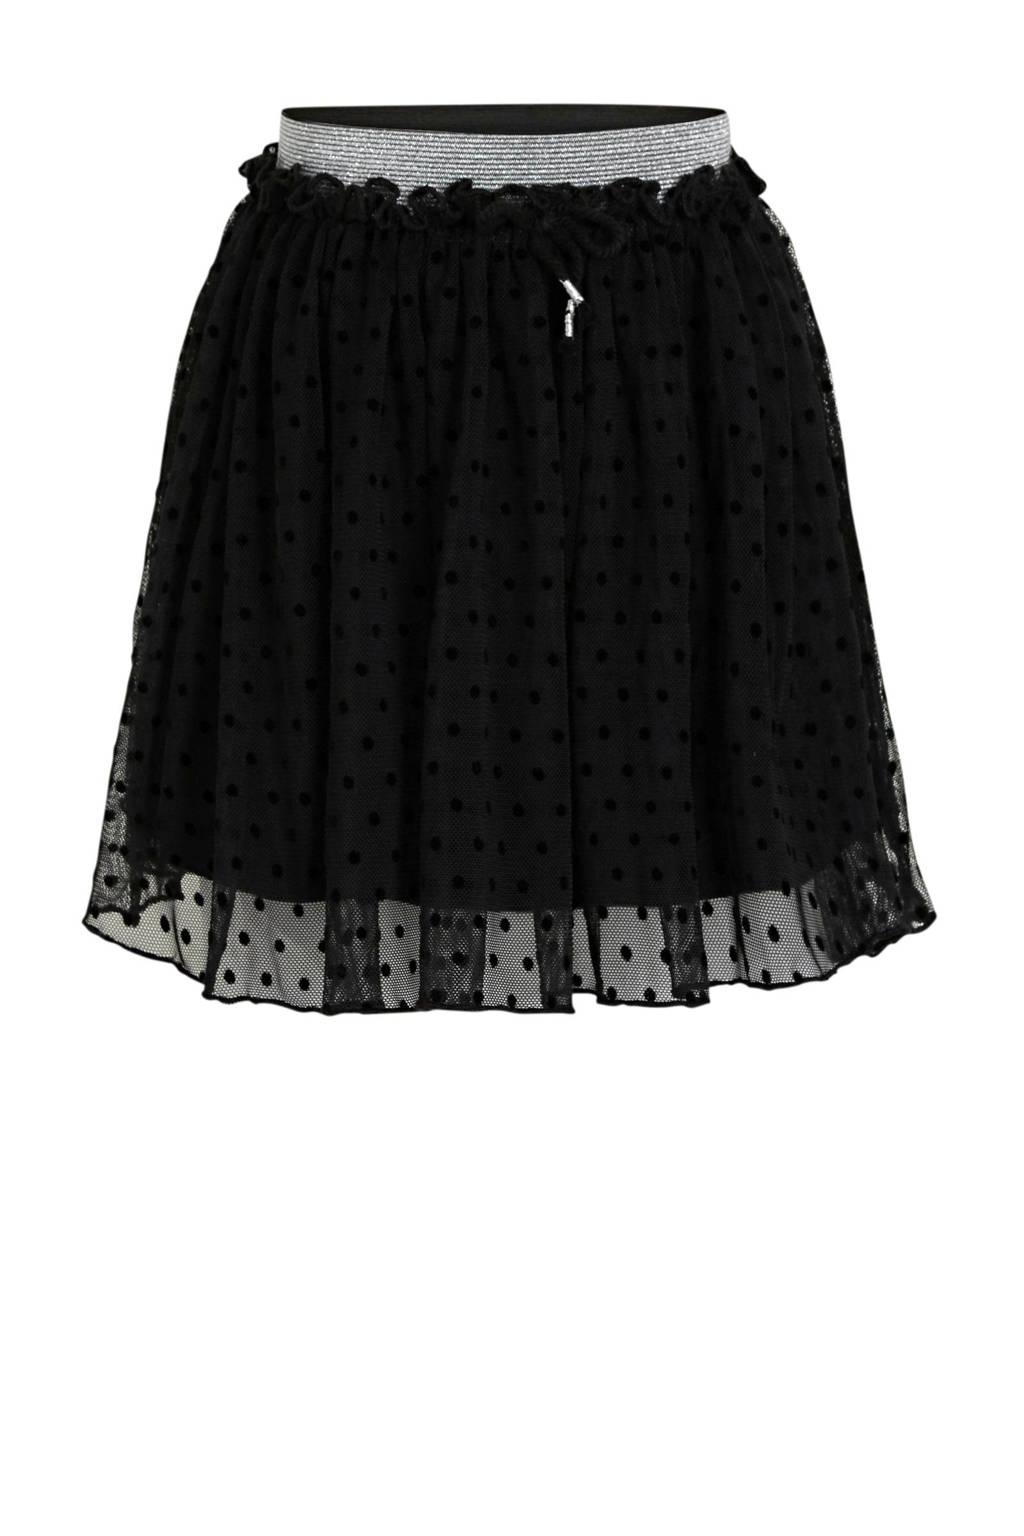 C&A XL Yessica rok met stippen zwart/zilver, Zwart/zilver